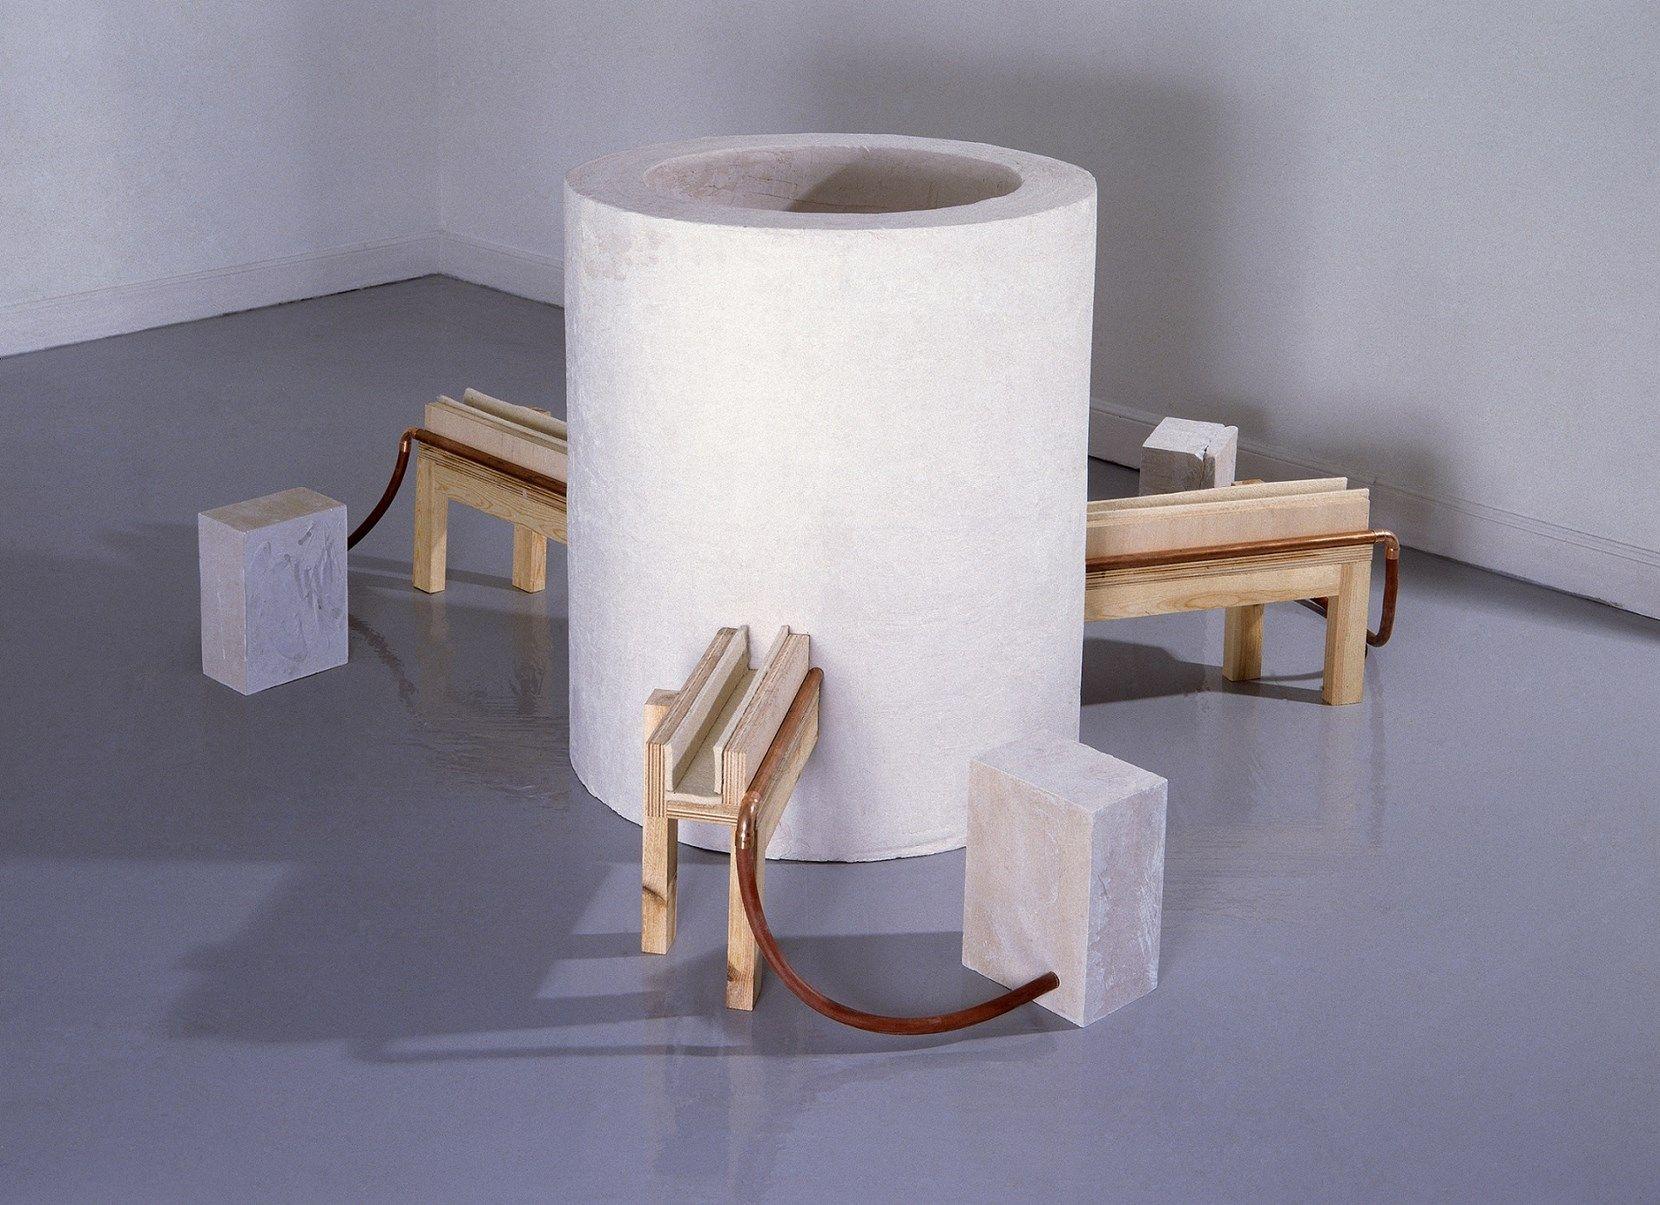 Pedro Cabrita Reis, Absorto, 1991. Legno, gesso, feltro, rame, gomma. Courtesy IVAM, Institut Valencià d'Art Modern